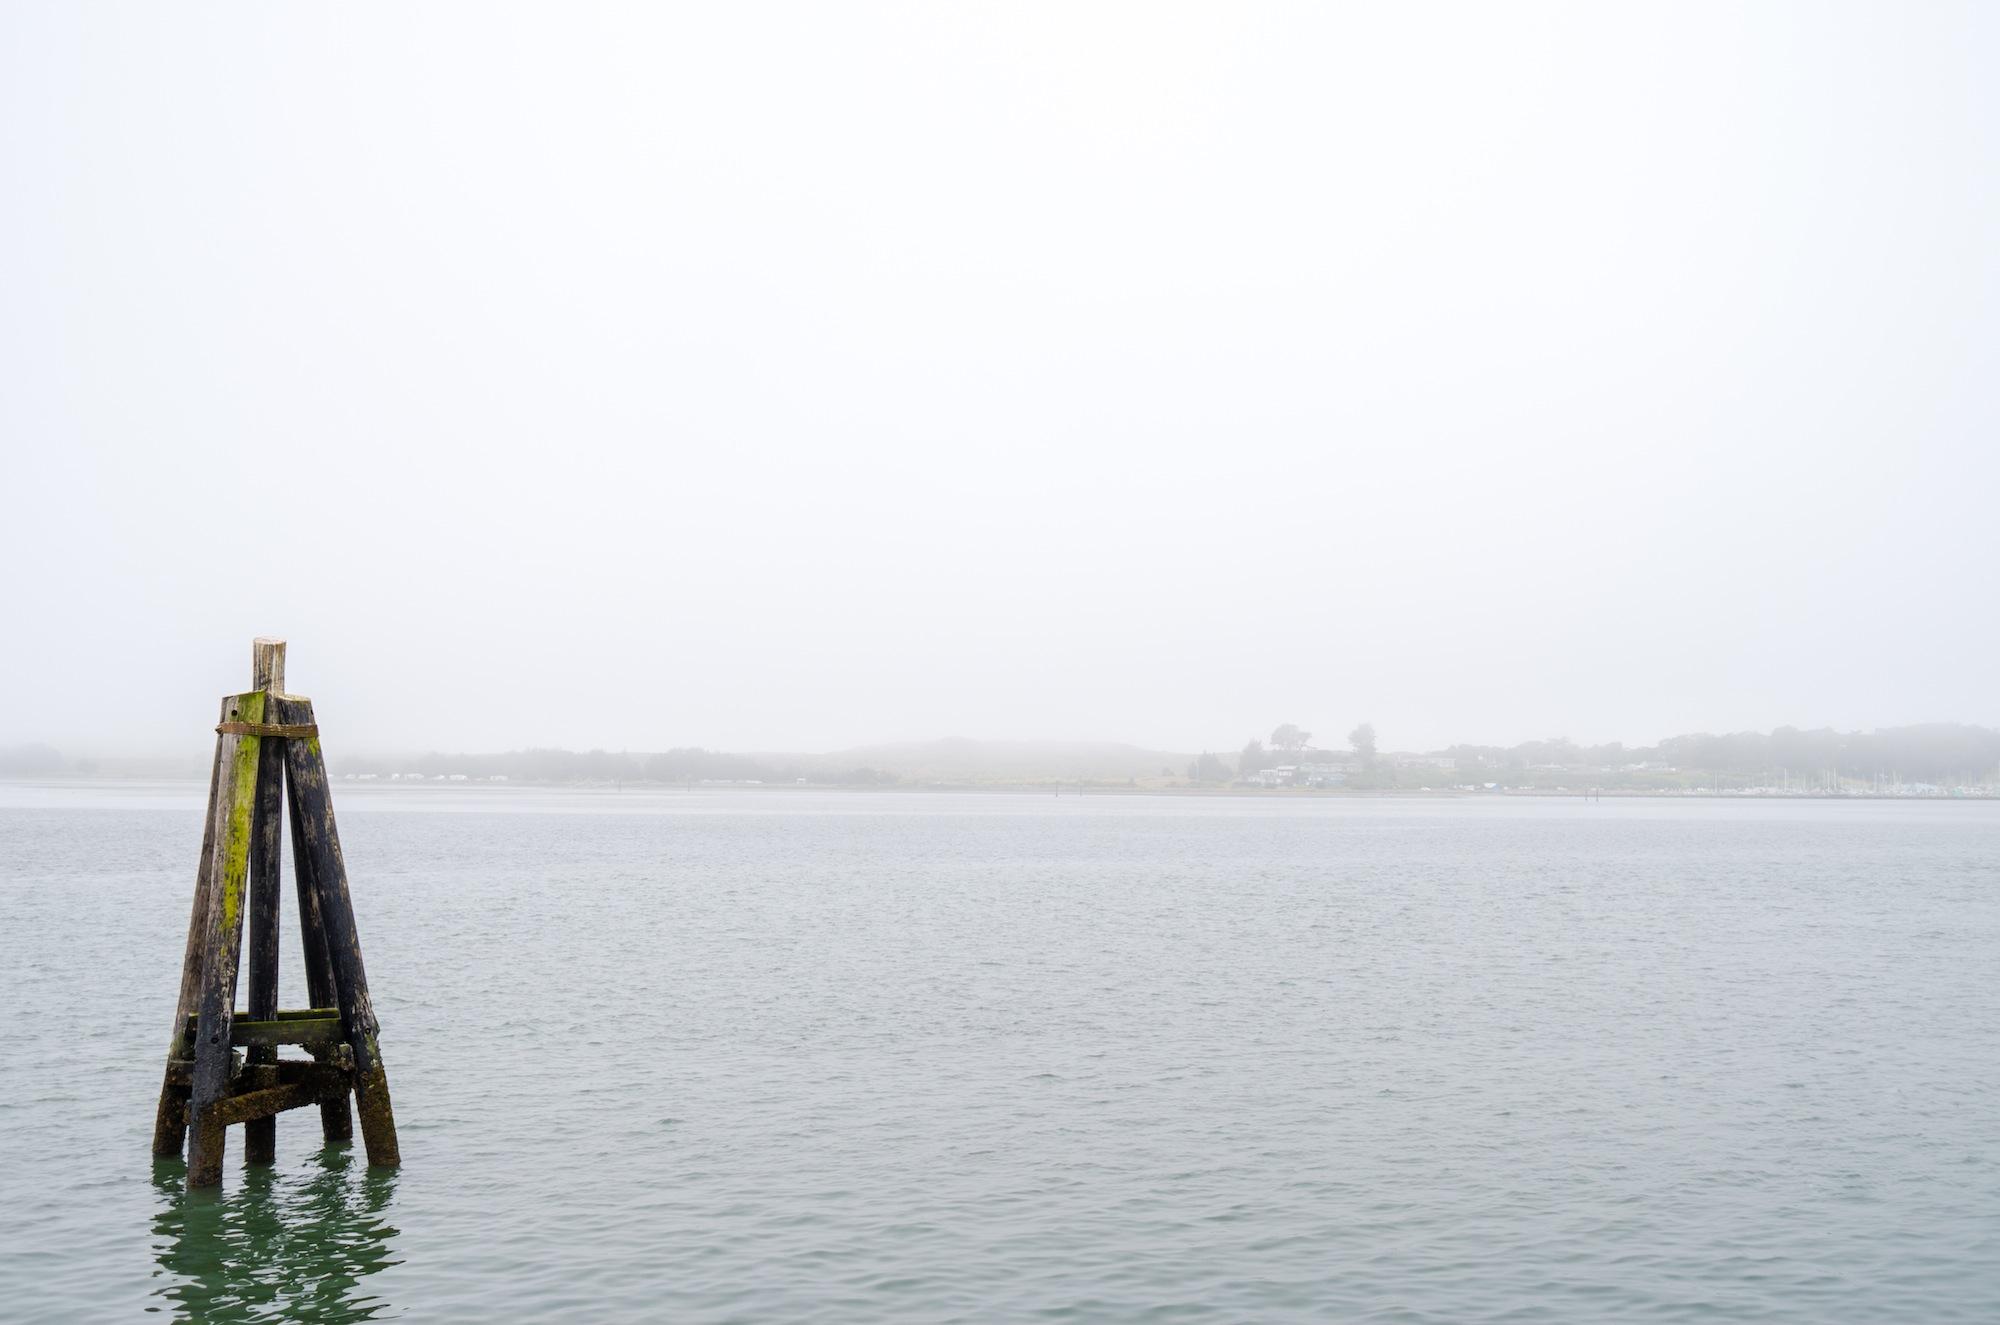 Leica X2 - Bodega Bay Pier Post